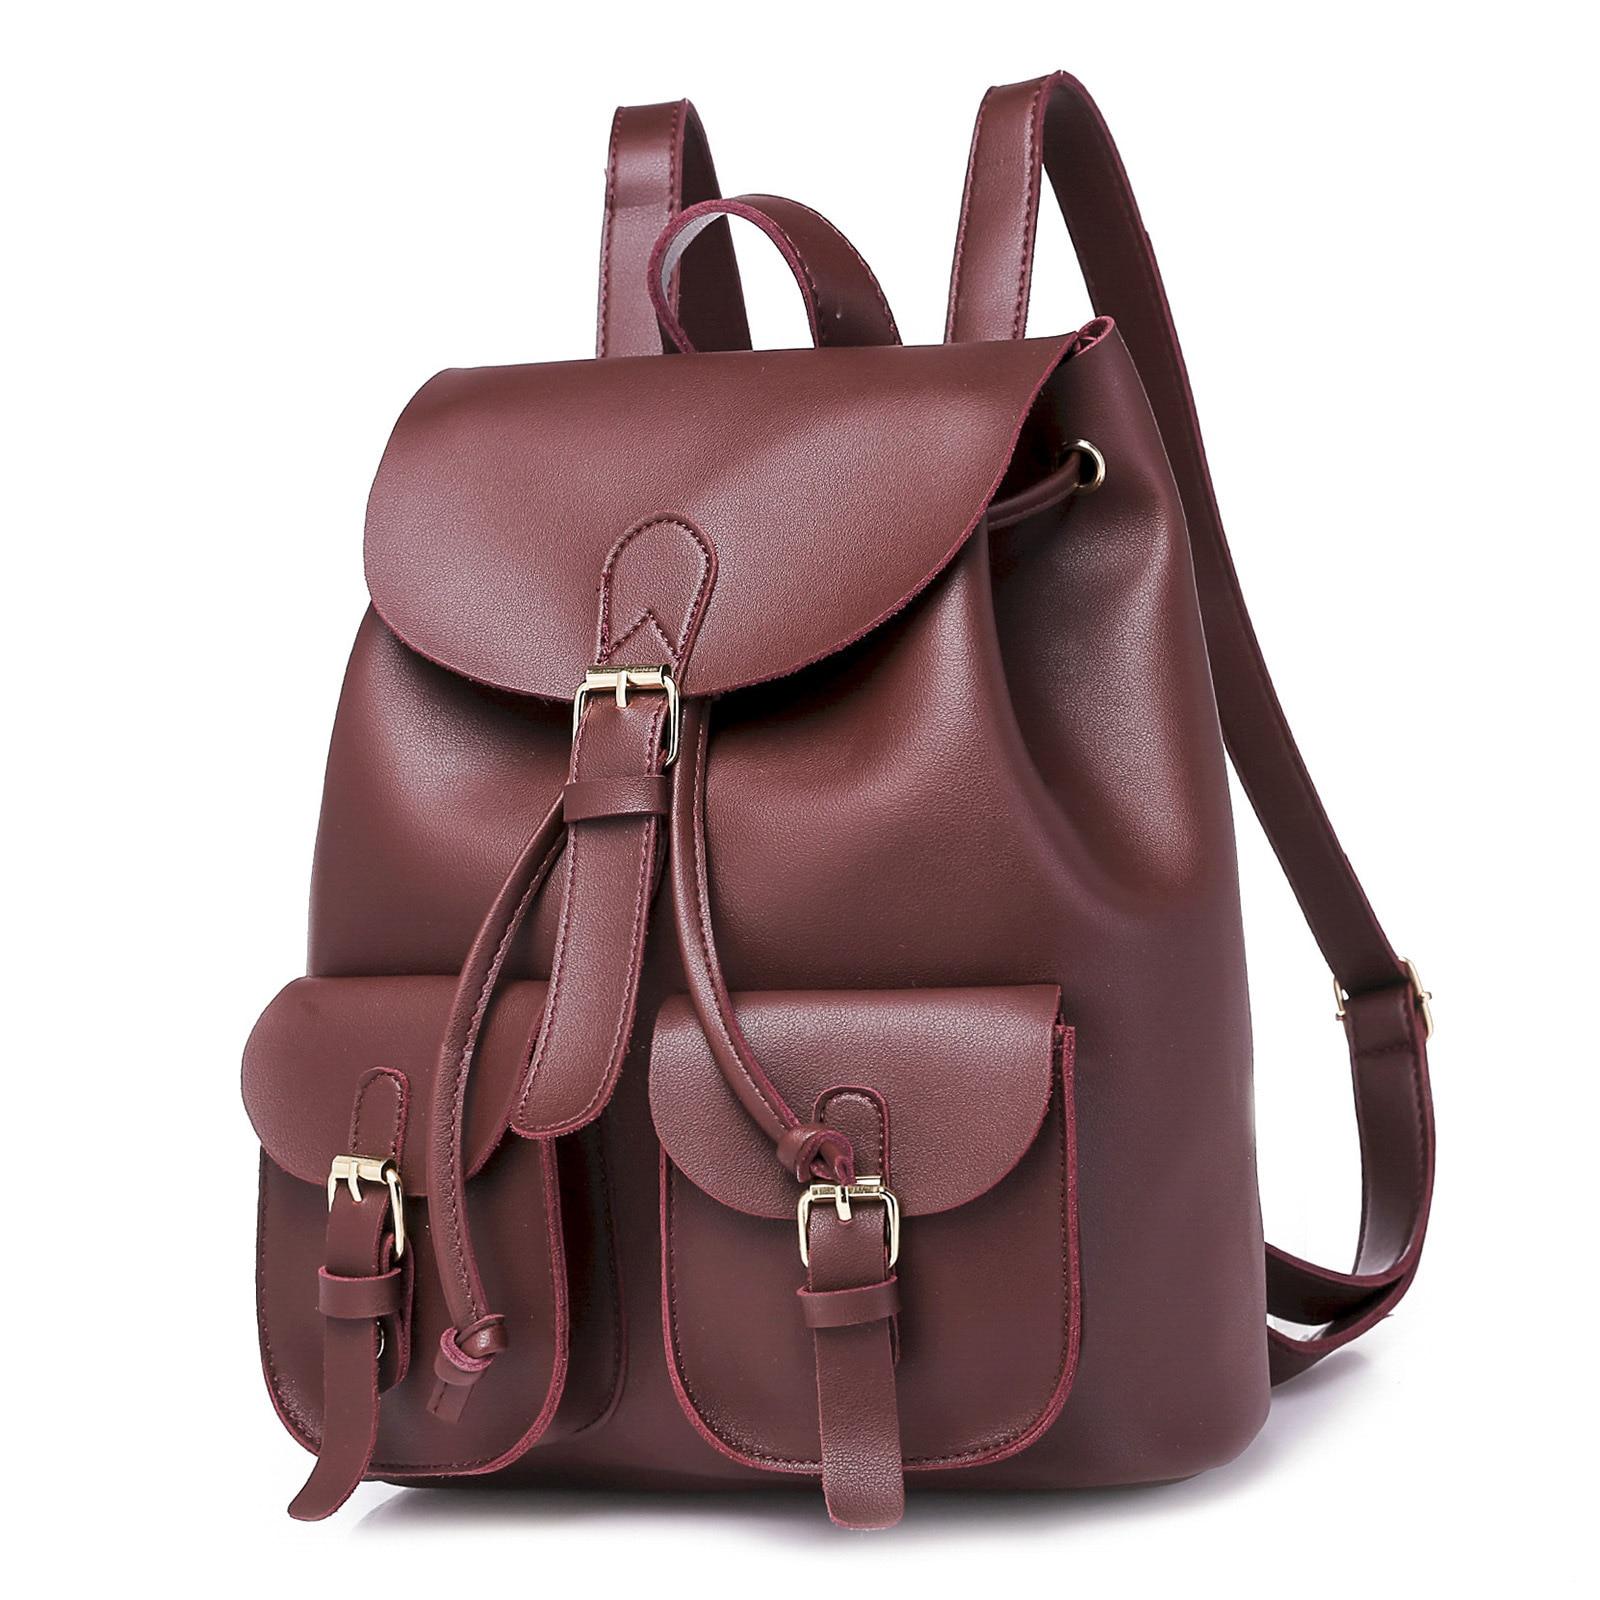 JS364J-2020 New Backpack Women's School Style Backpack